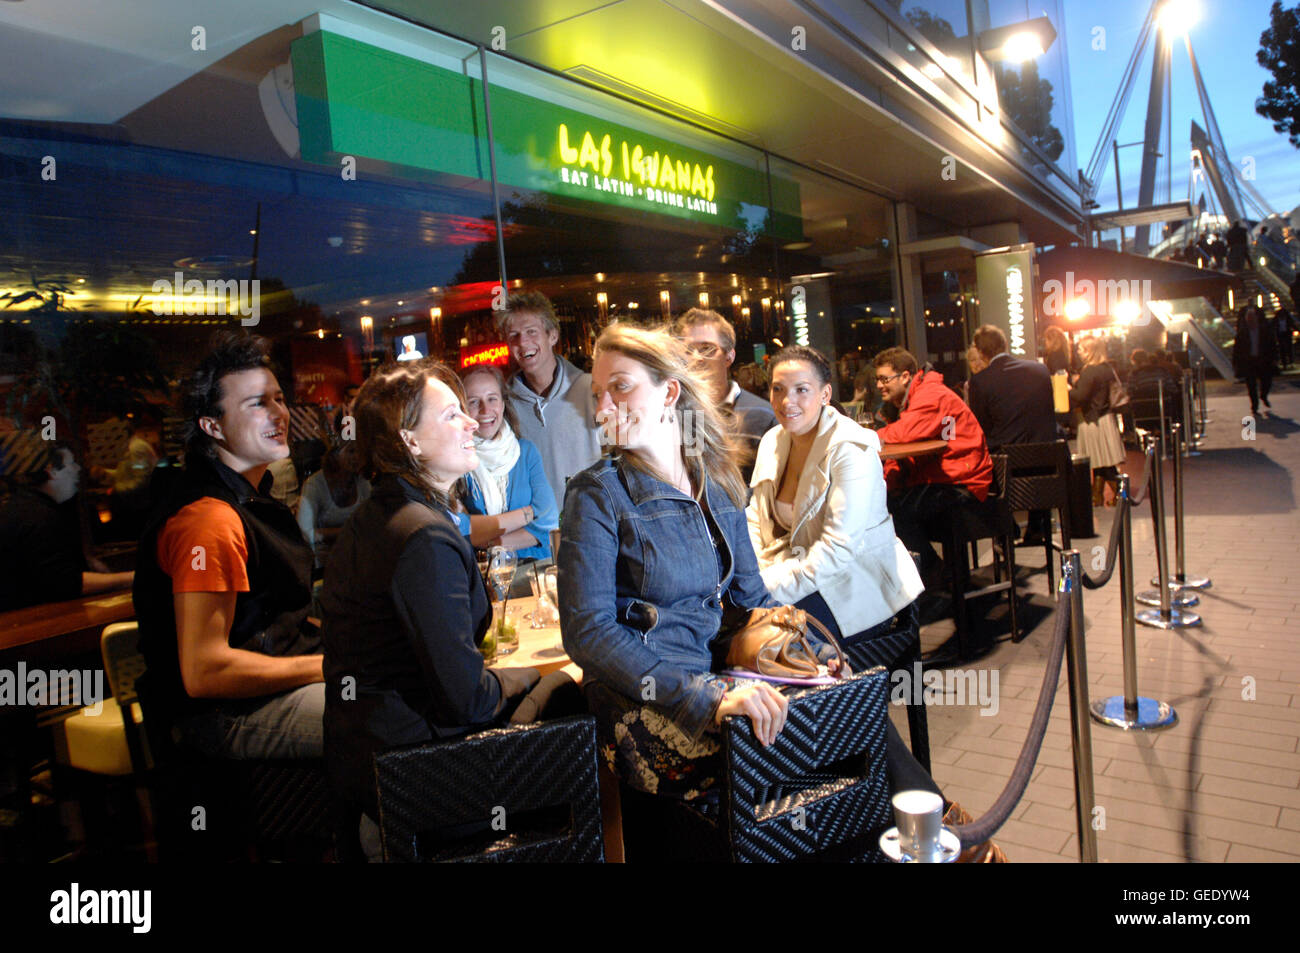 People sat outside Las Iguanas Brazilian bar, South Bank. London 2010 - Stock Image